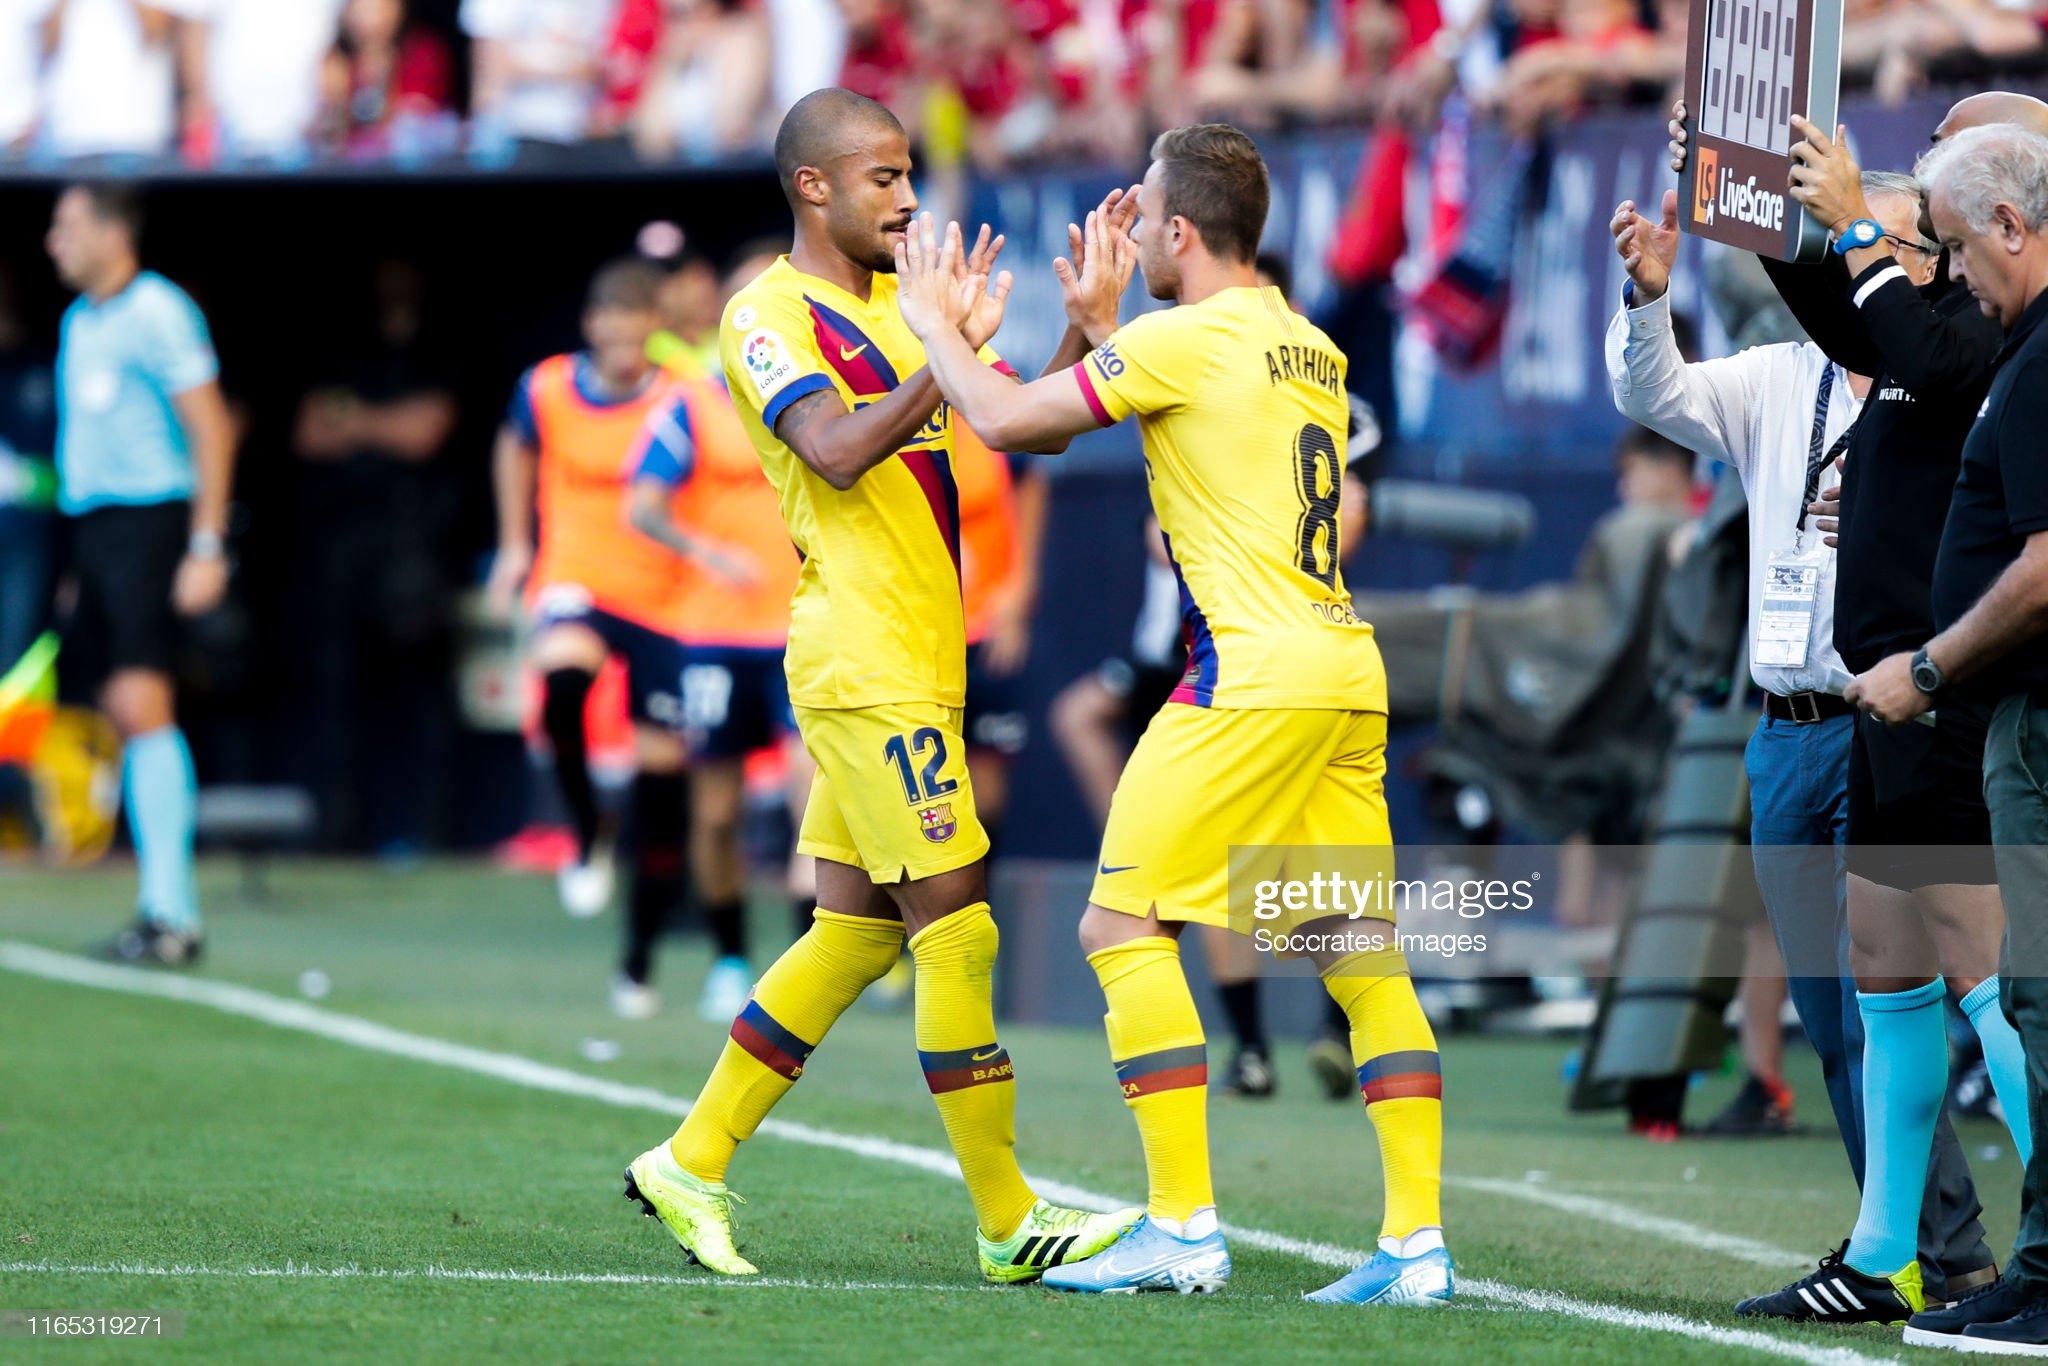 صور مباراة : أوساسونا - برشلونة 2-2 ( 31-08-2019 )  Rafinha-of-fc-barcelona-arthur-of-fc-barcelona-during-the-la-liga-picture-id1165319271?s=2048x2048